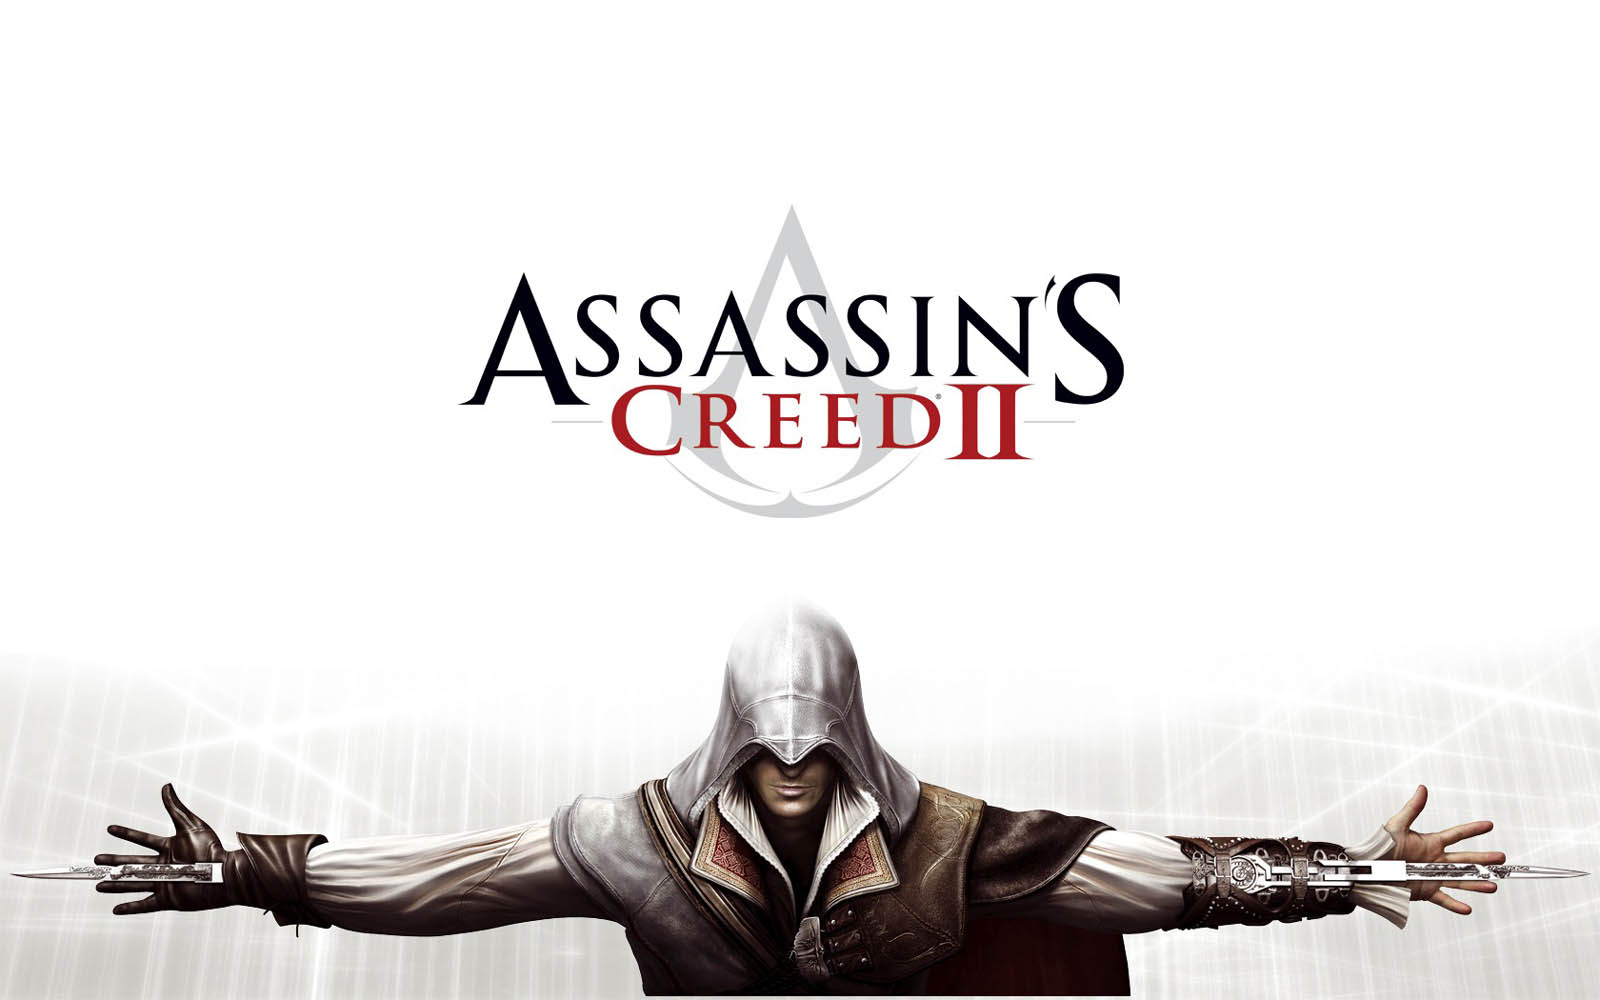 assassins creed 5 wallpaper - photo #17